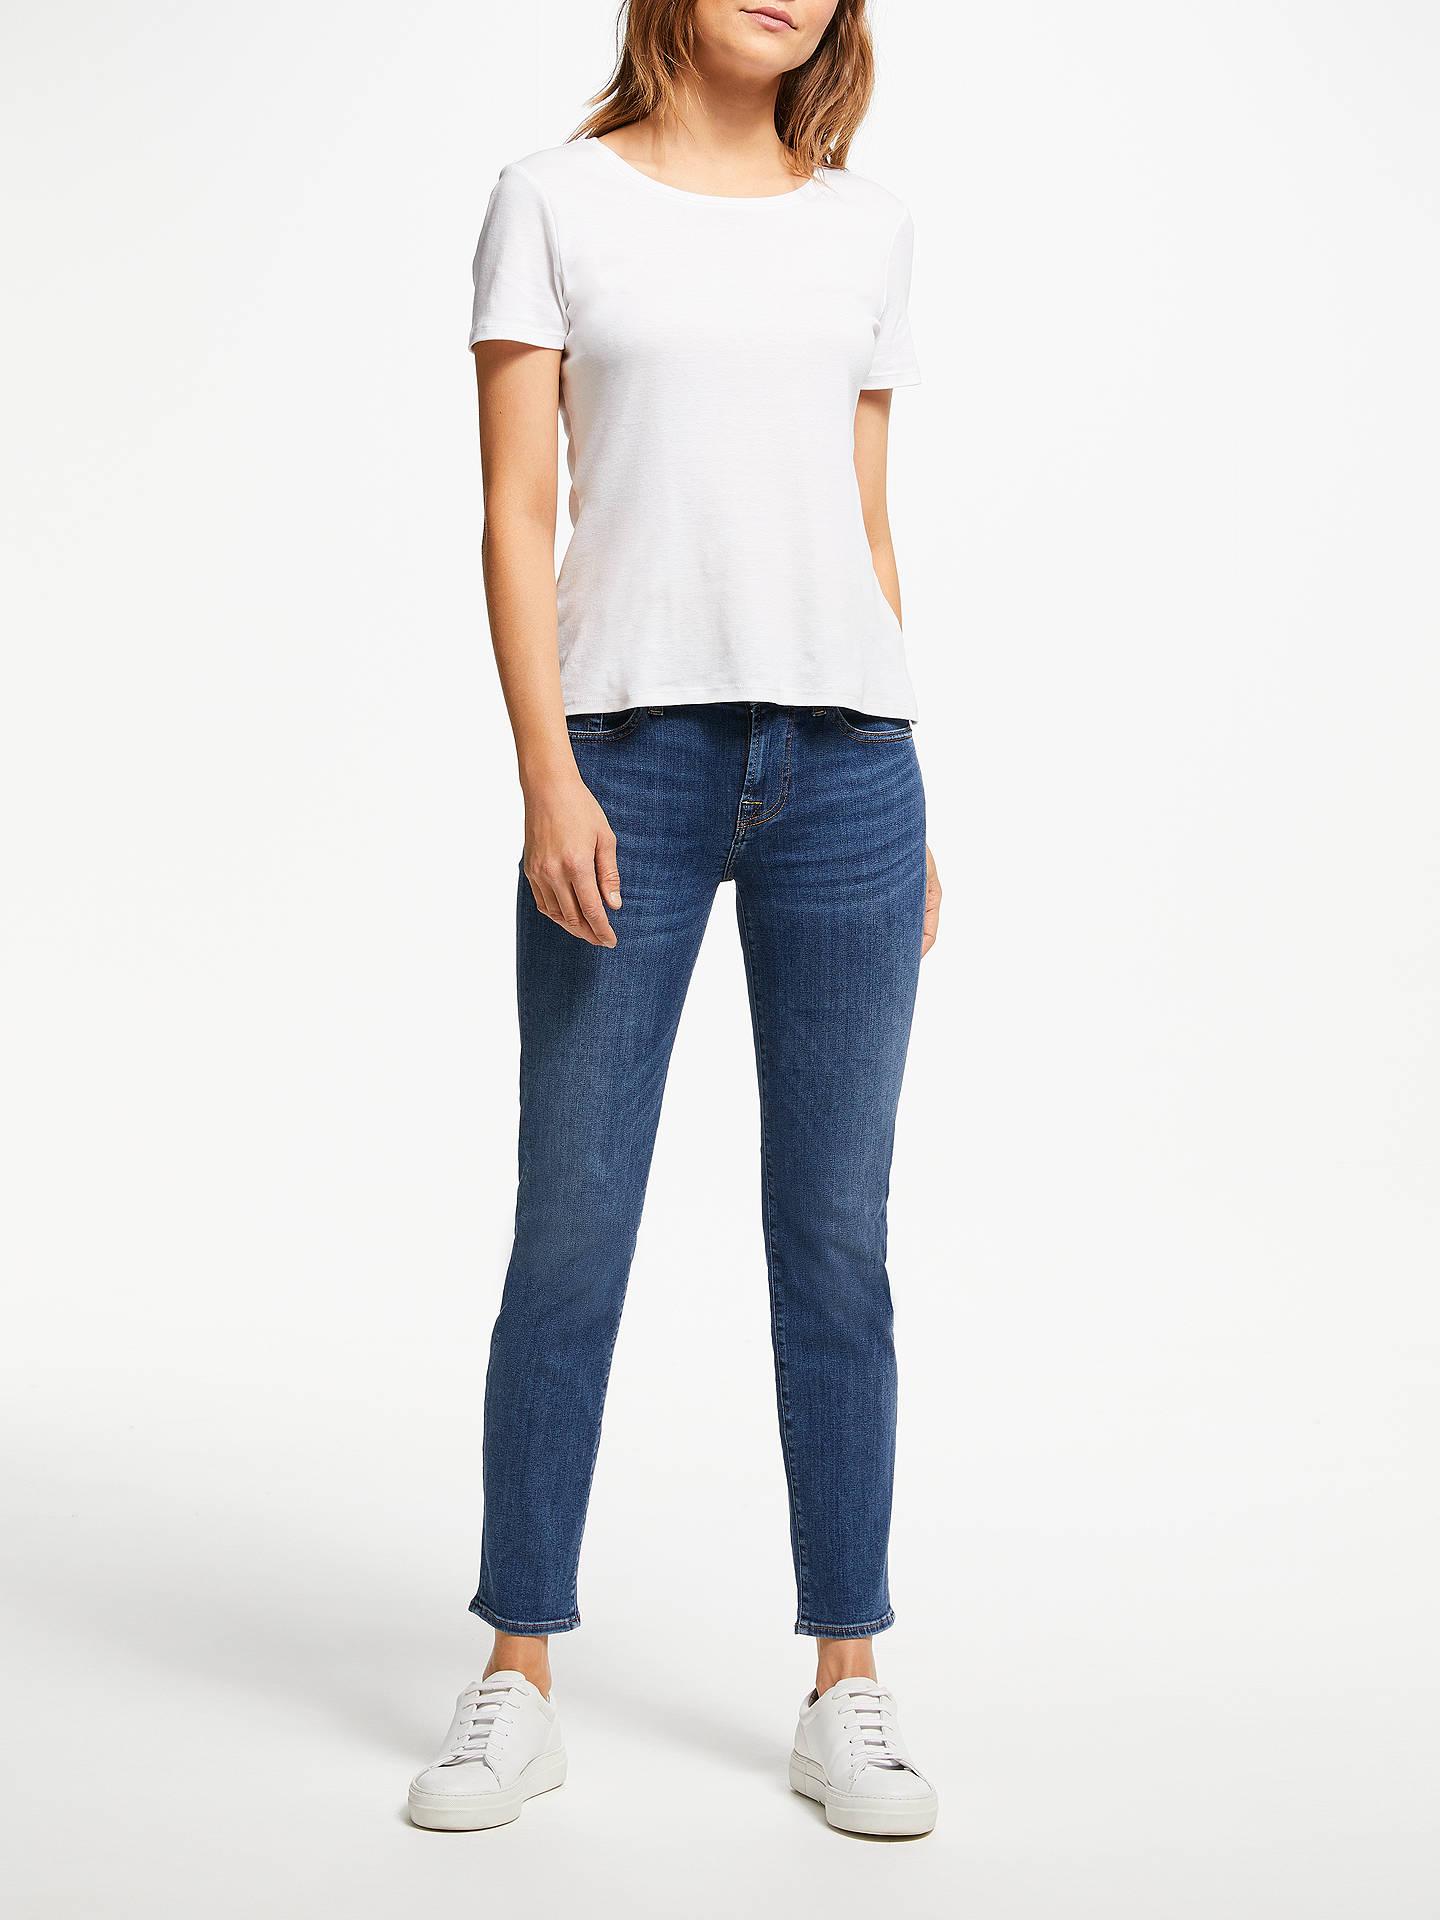 Tall and thin teen beauty roxan image